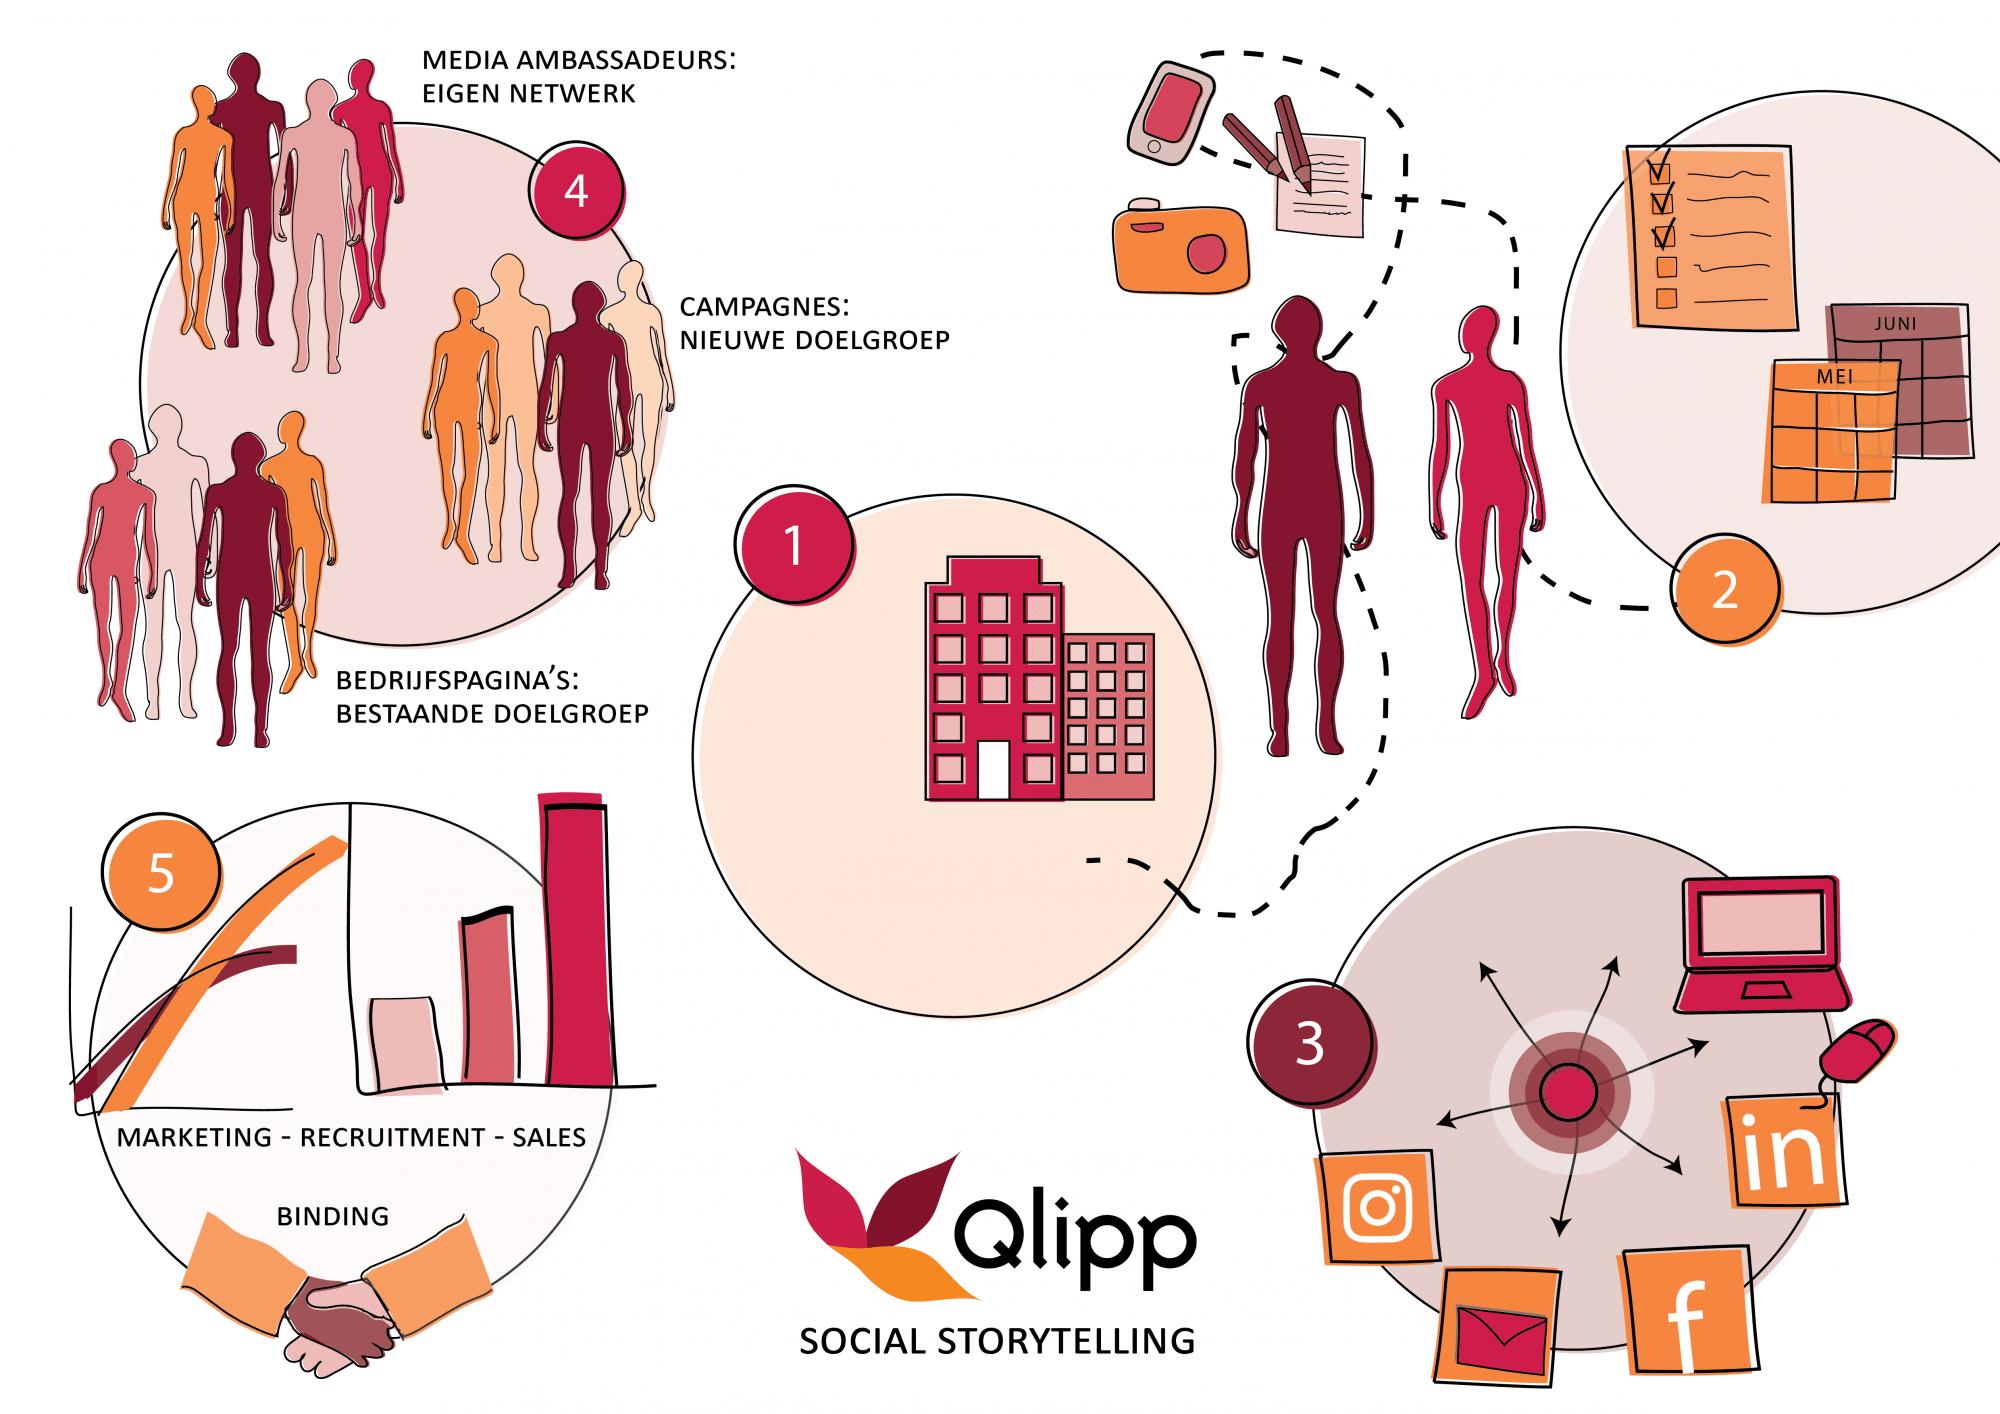 Qlipp_social_storytelling_016